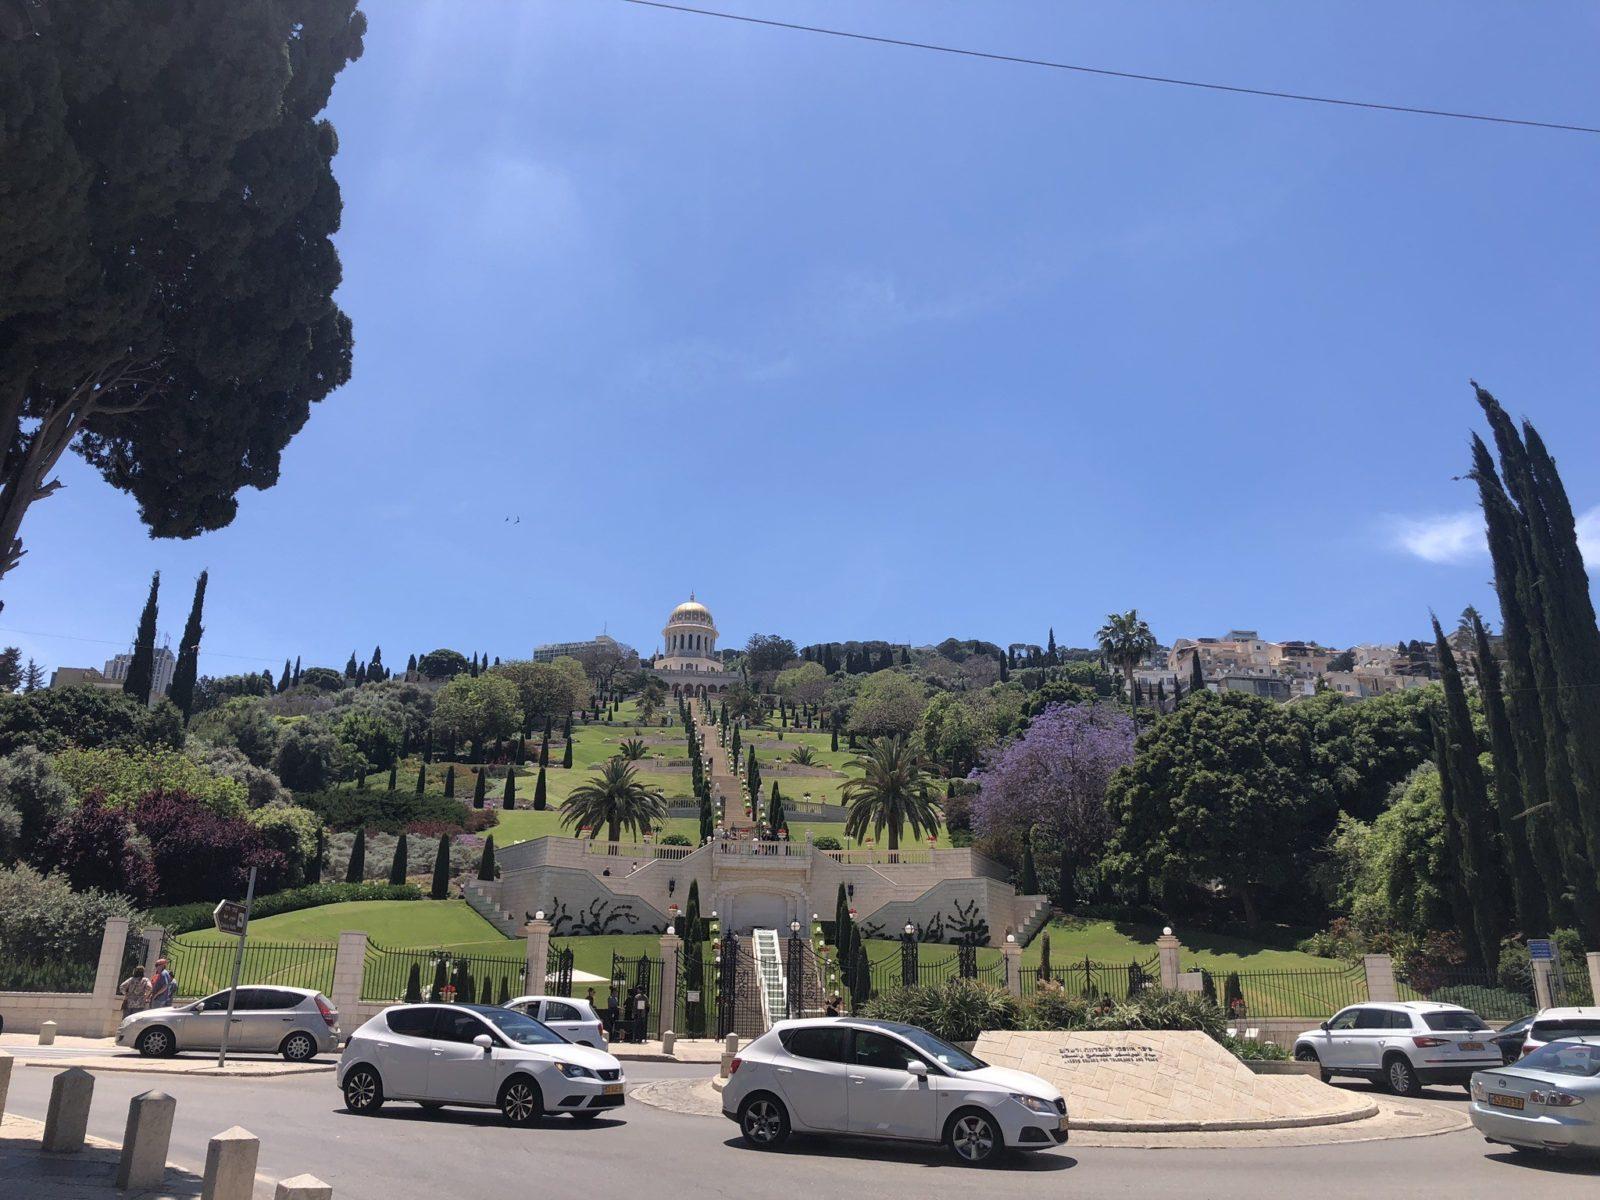 The Baha'i Gardens in Haifa